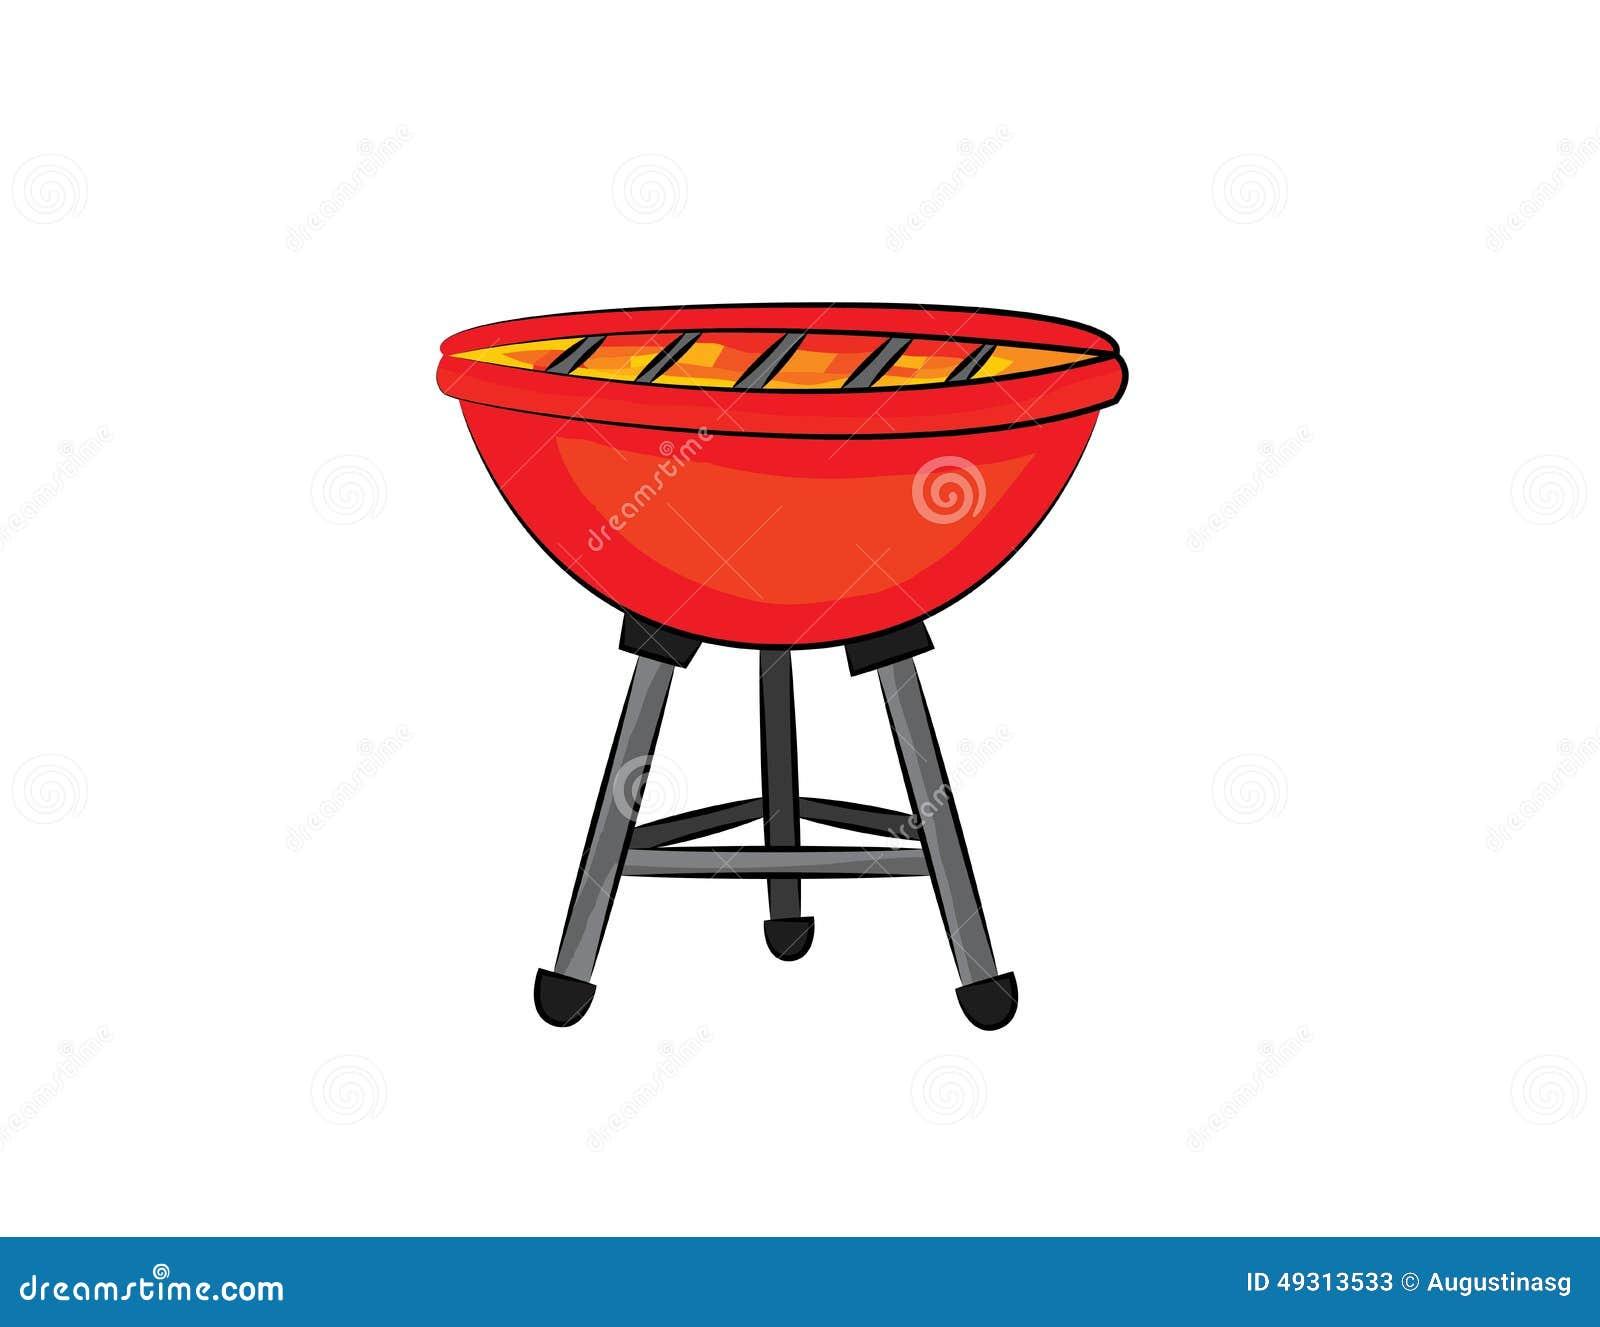 grill cartoon stock illustration illustration of object free bbq clipart borders free bbq clipart invitation